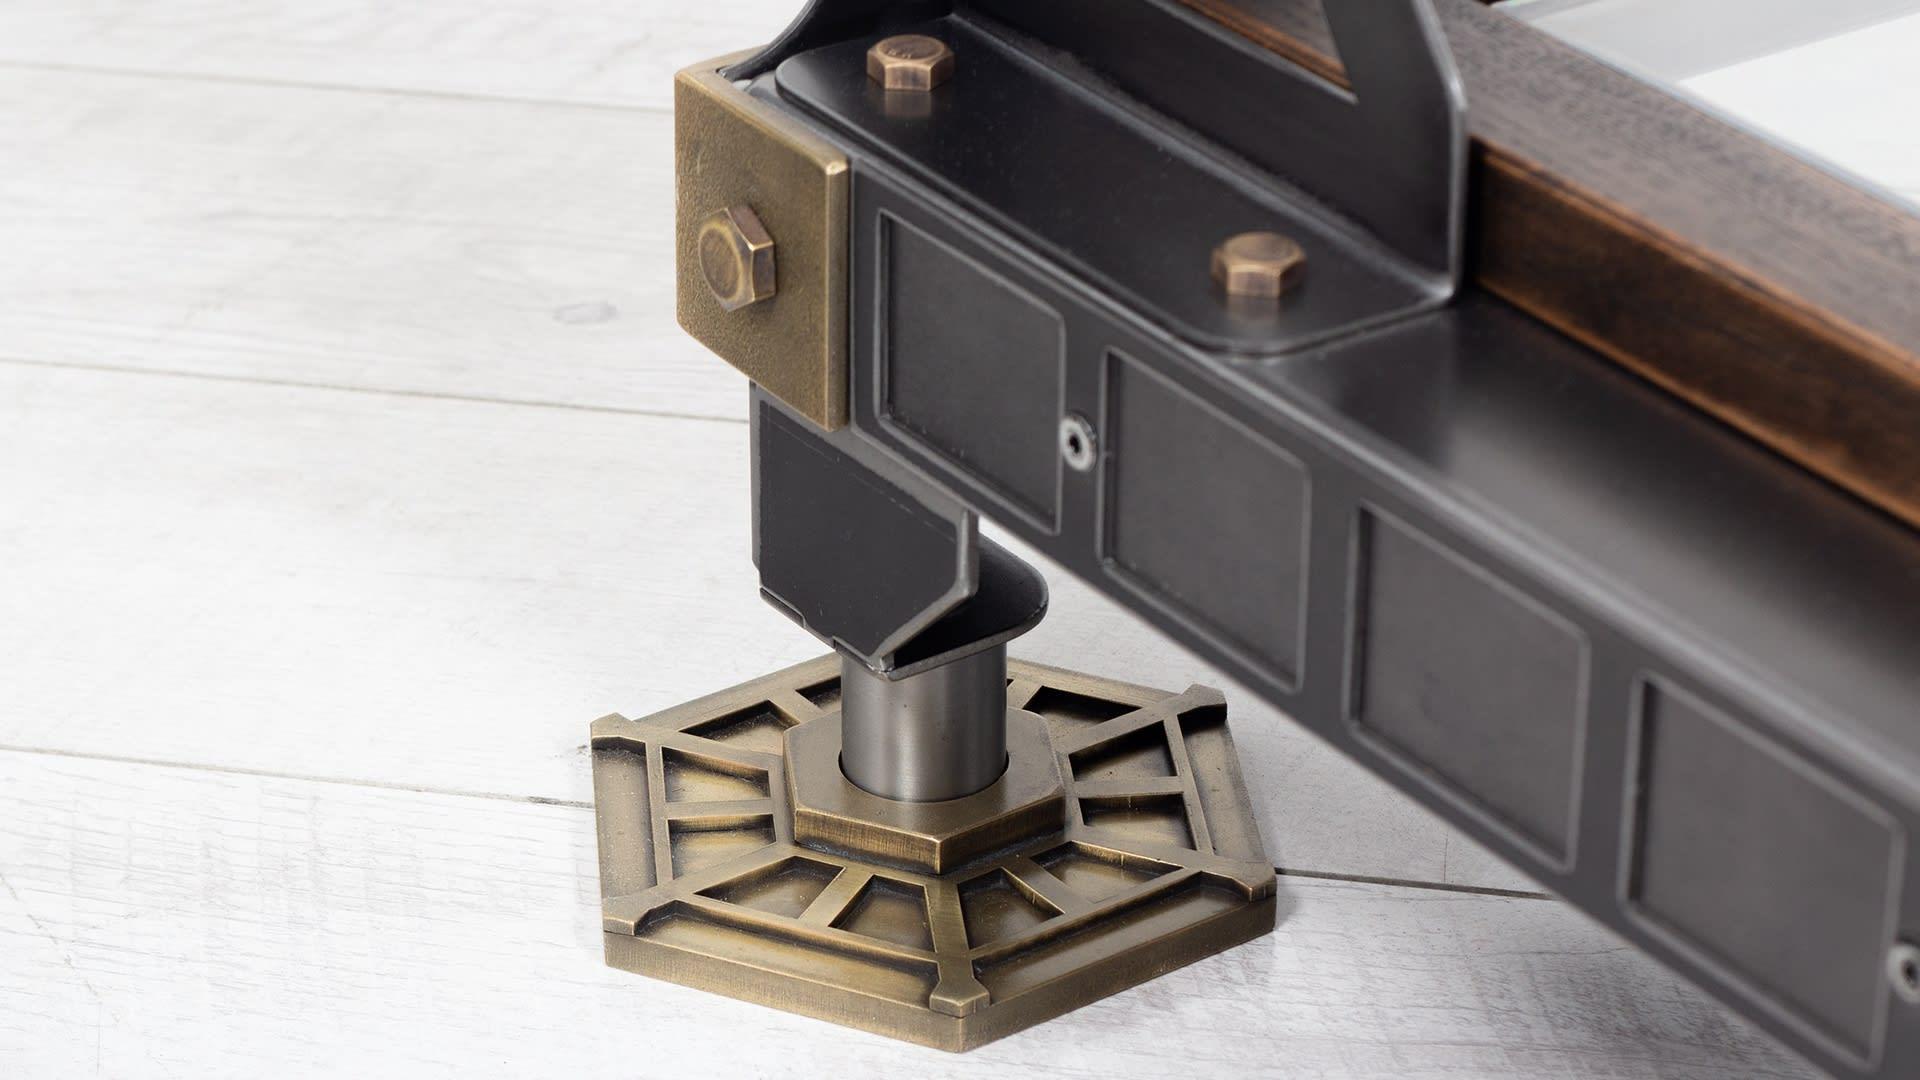 Steel Vintage Brunel Display Stand leg closeup